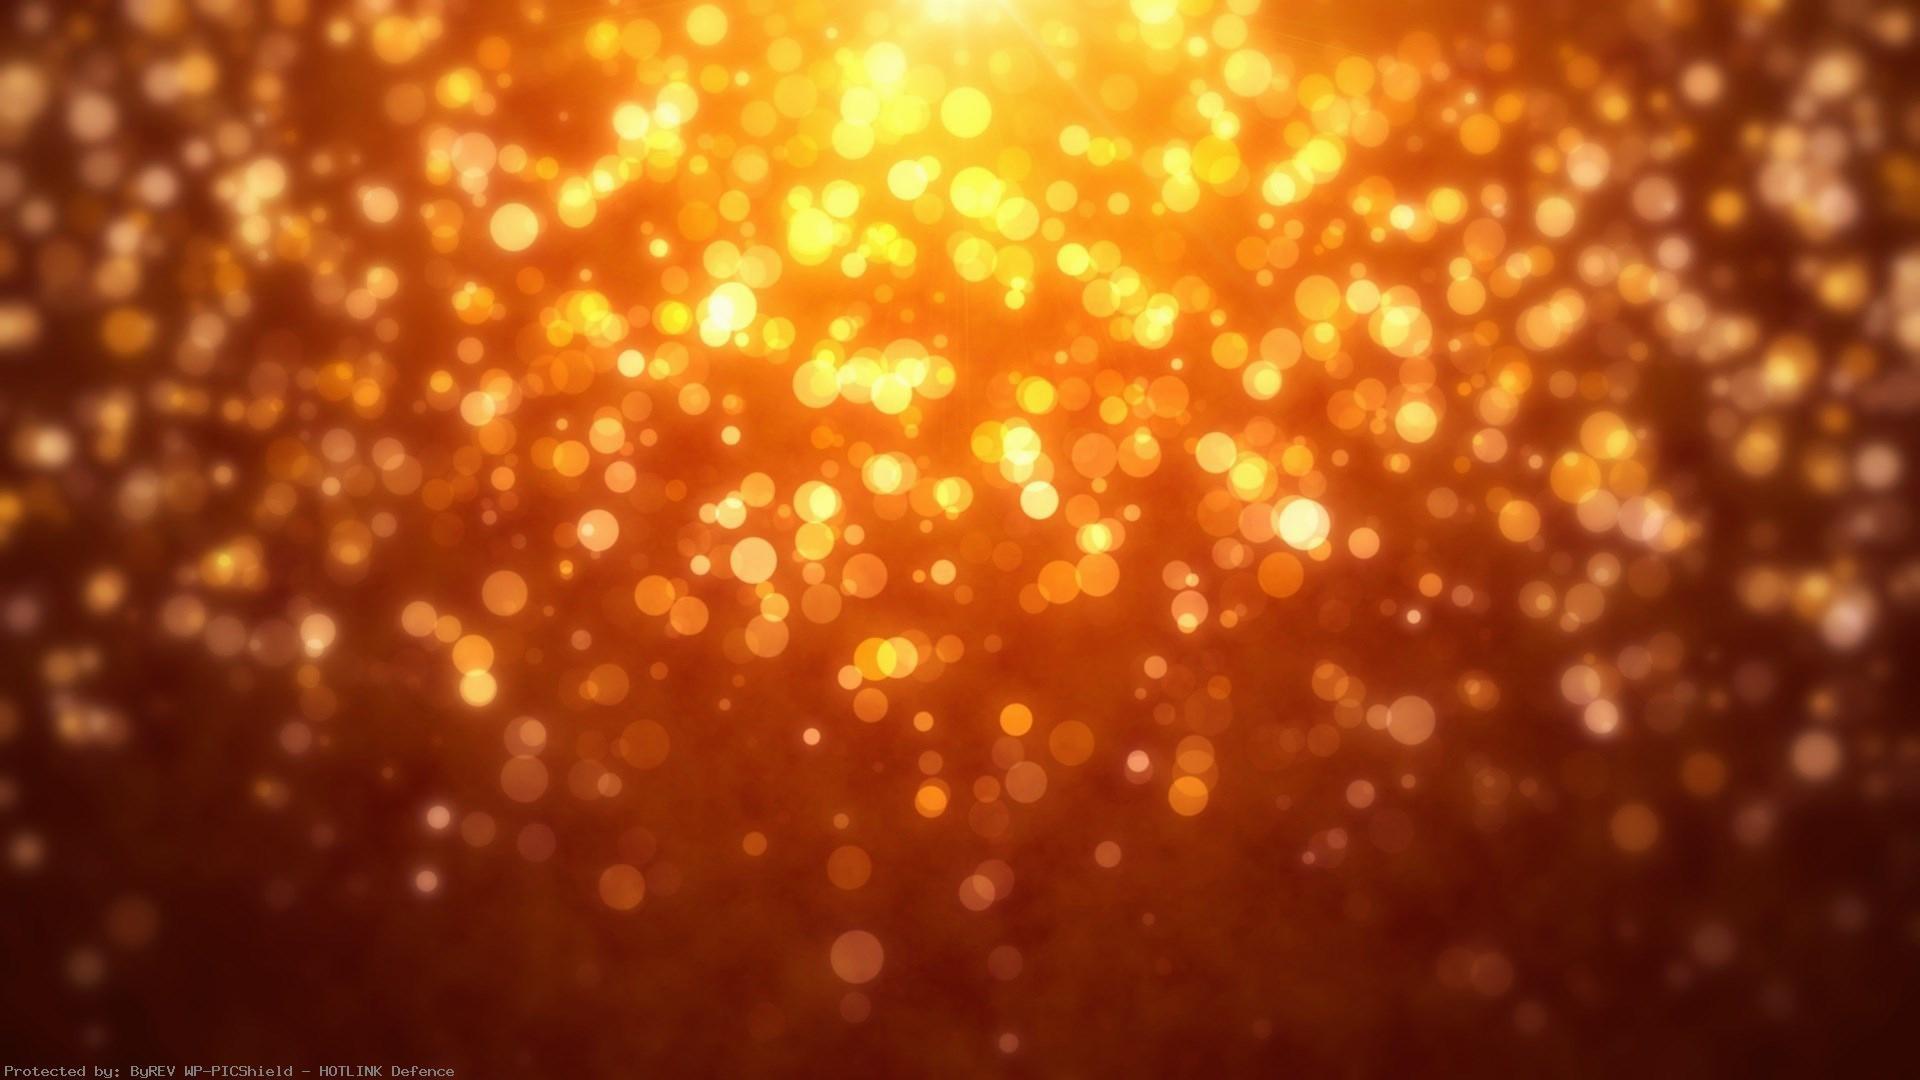 gold-glitter-hd-1080p-wallpaper-wp8007201